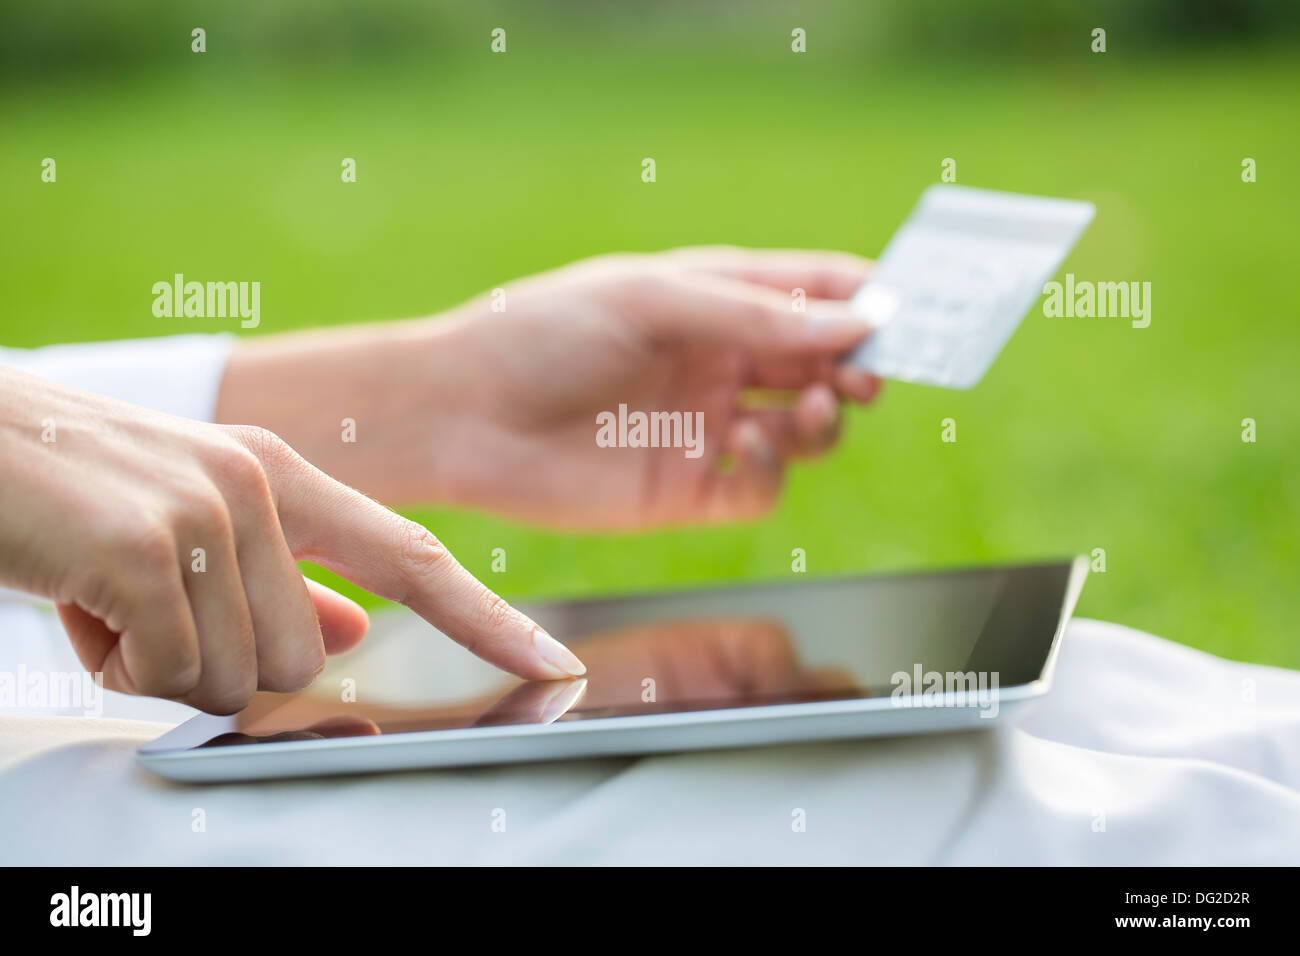 Equipo exterior femenino dedo web tarjeta de plástico Imagen De Stock